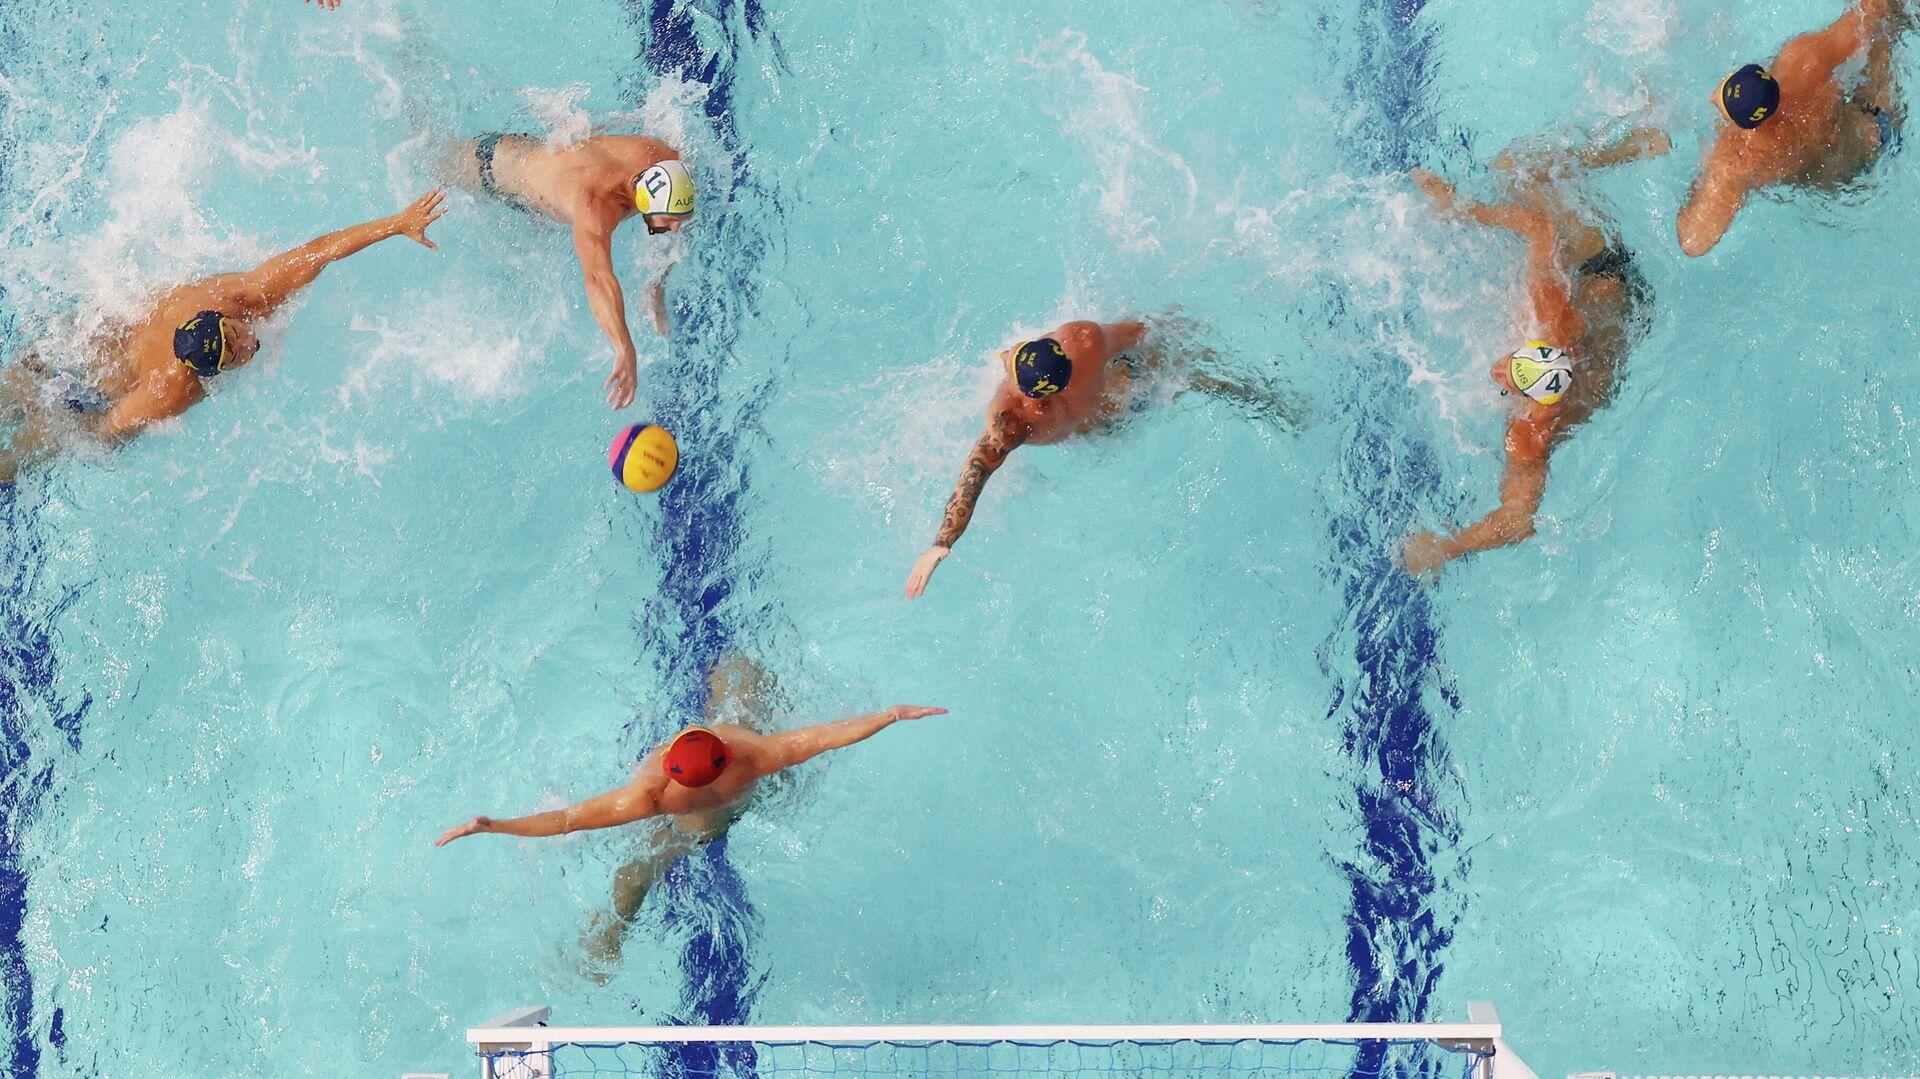 Tokyo 2020 Olympics - Water Polo - Men - Group B - Australia v Kazakhstan - TWC - Tatsumi Water Polo Centre, Tokyo, Japan - August 2, 2021.  Rhys Howden of Australia scores against Pavel Lipilin of Kazakhstan. REUTERS/Gonzalo Fuentes - РИА Новости, 1920, 02.08.2021